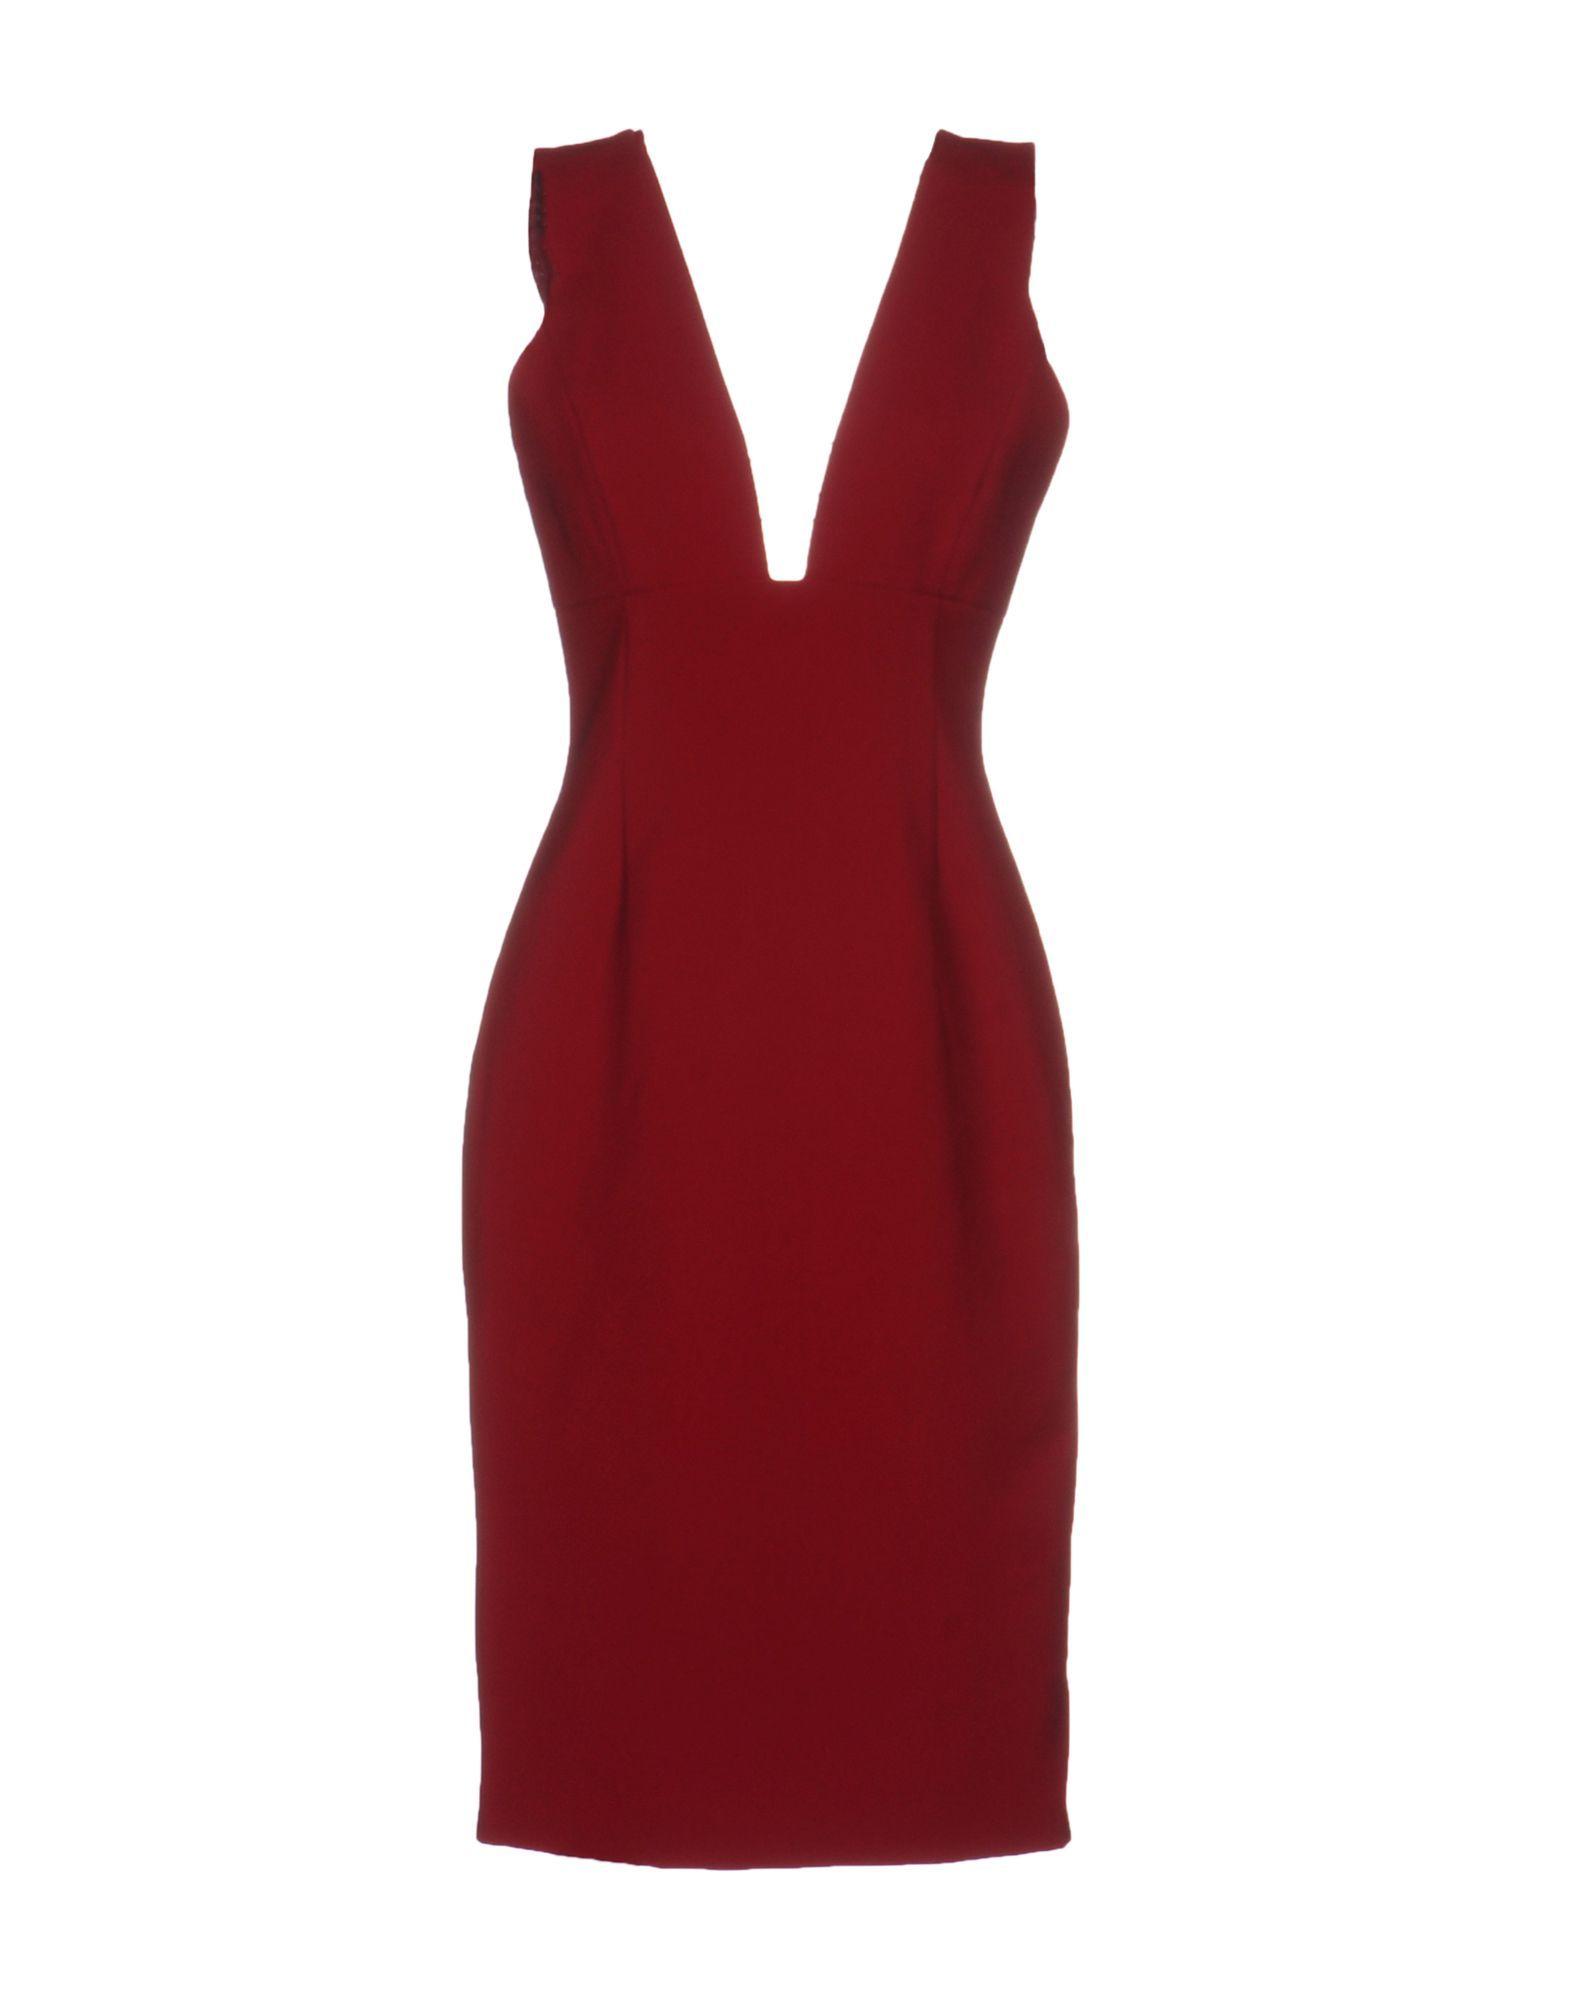 Alice + Olivia Maroon Plunge Neckline Dress